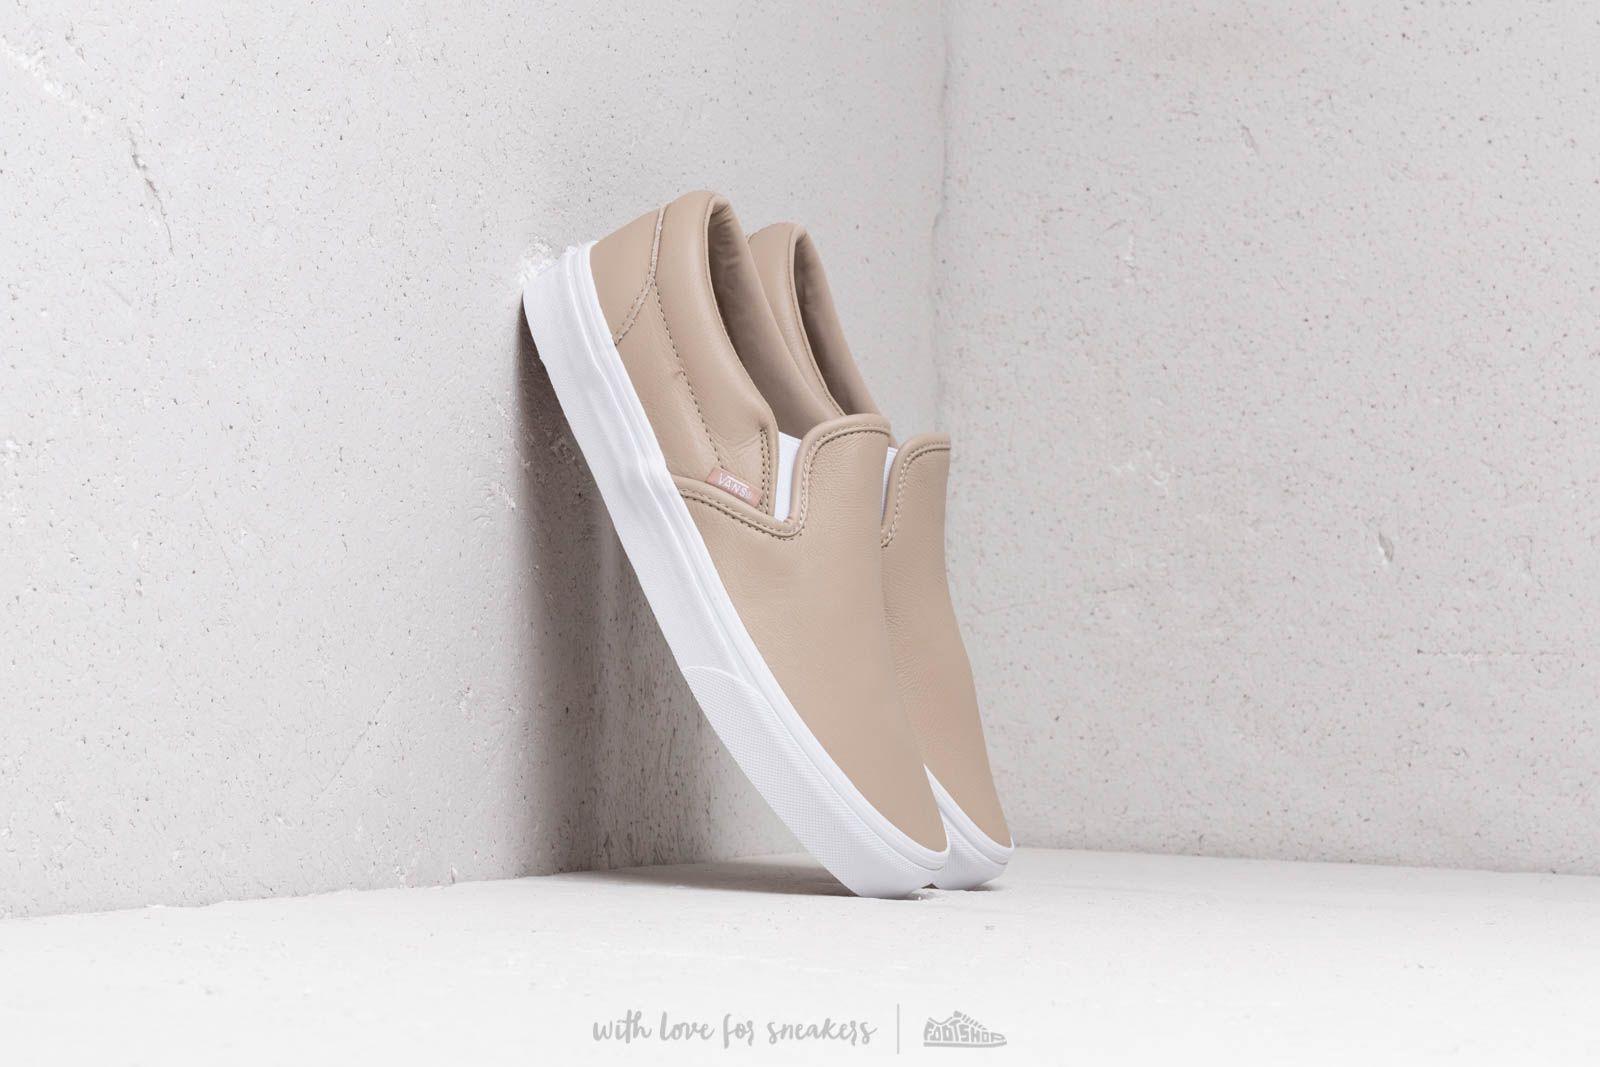 Pánské tenisky a boty Vans Classic Slip-On (Leather) Humus/ True White